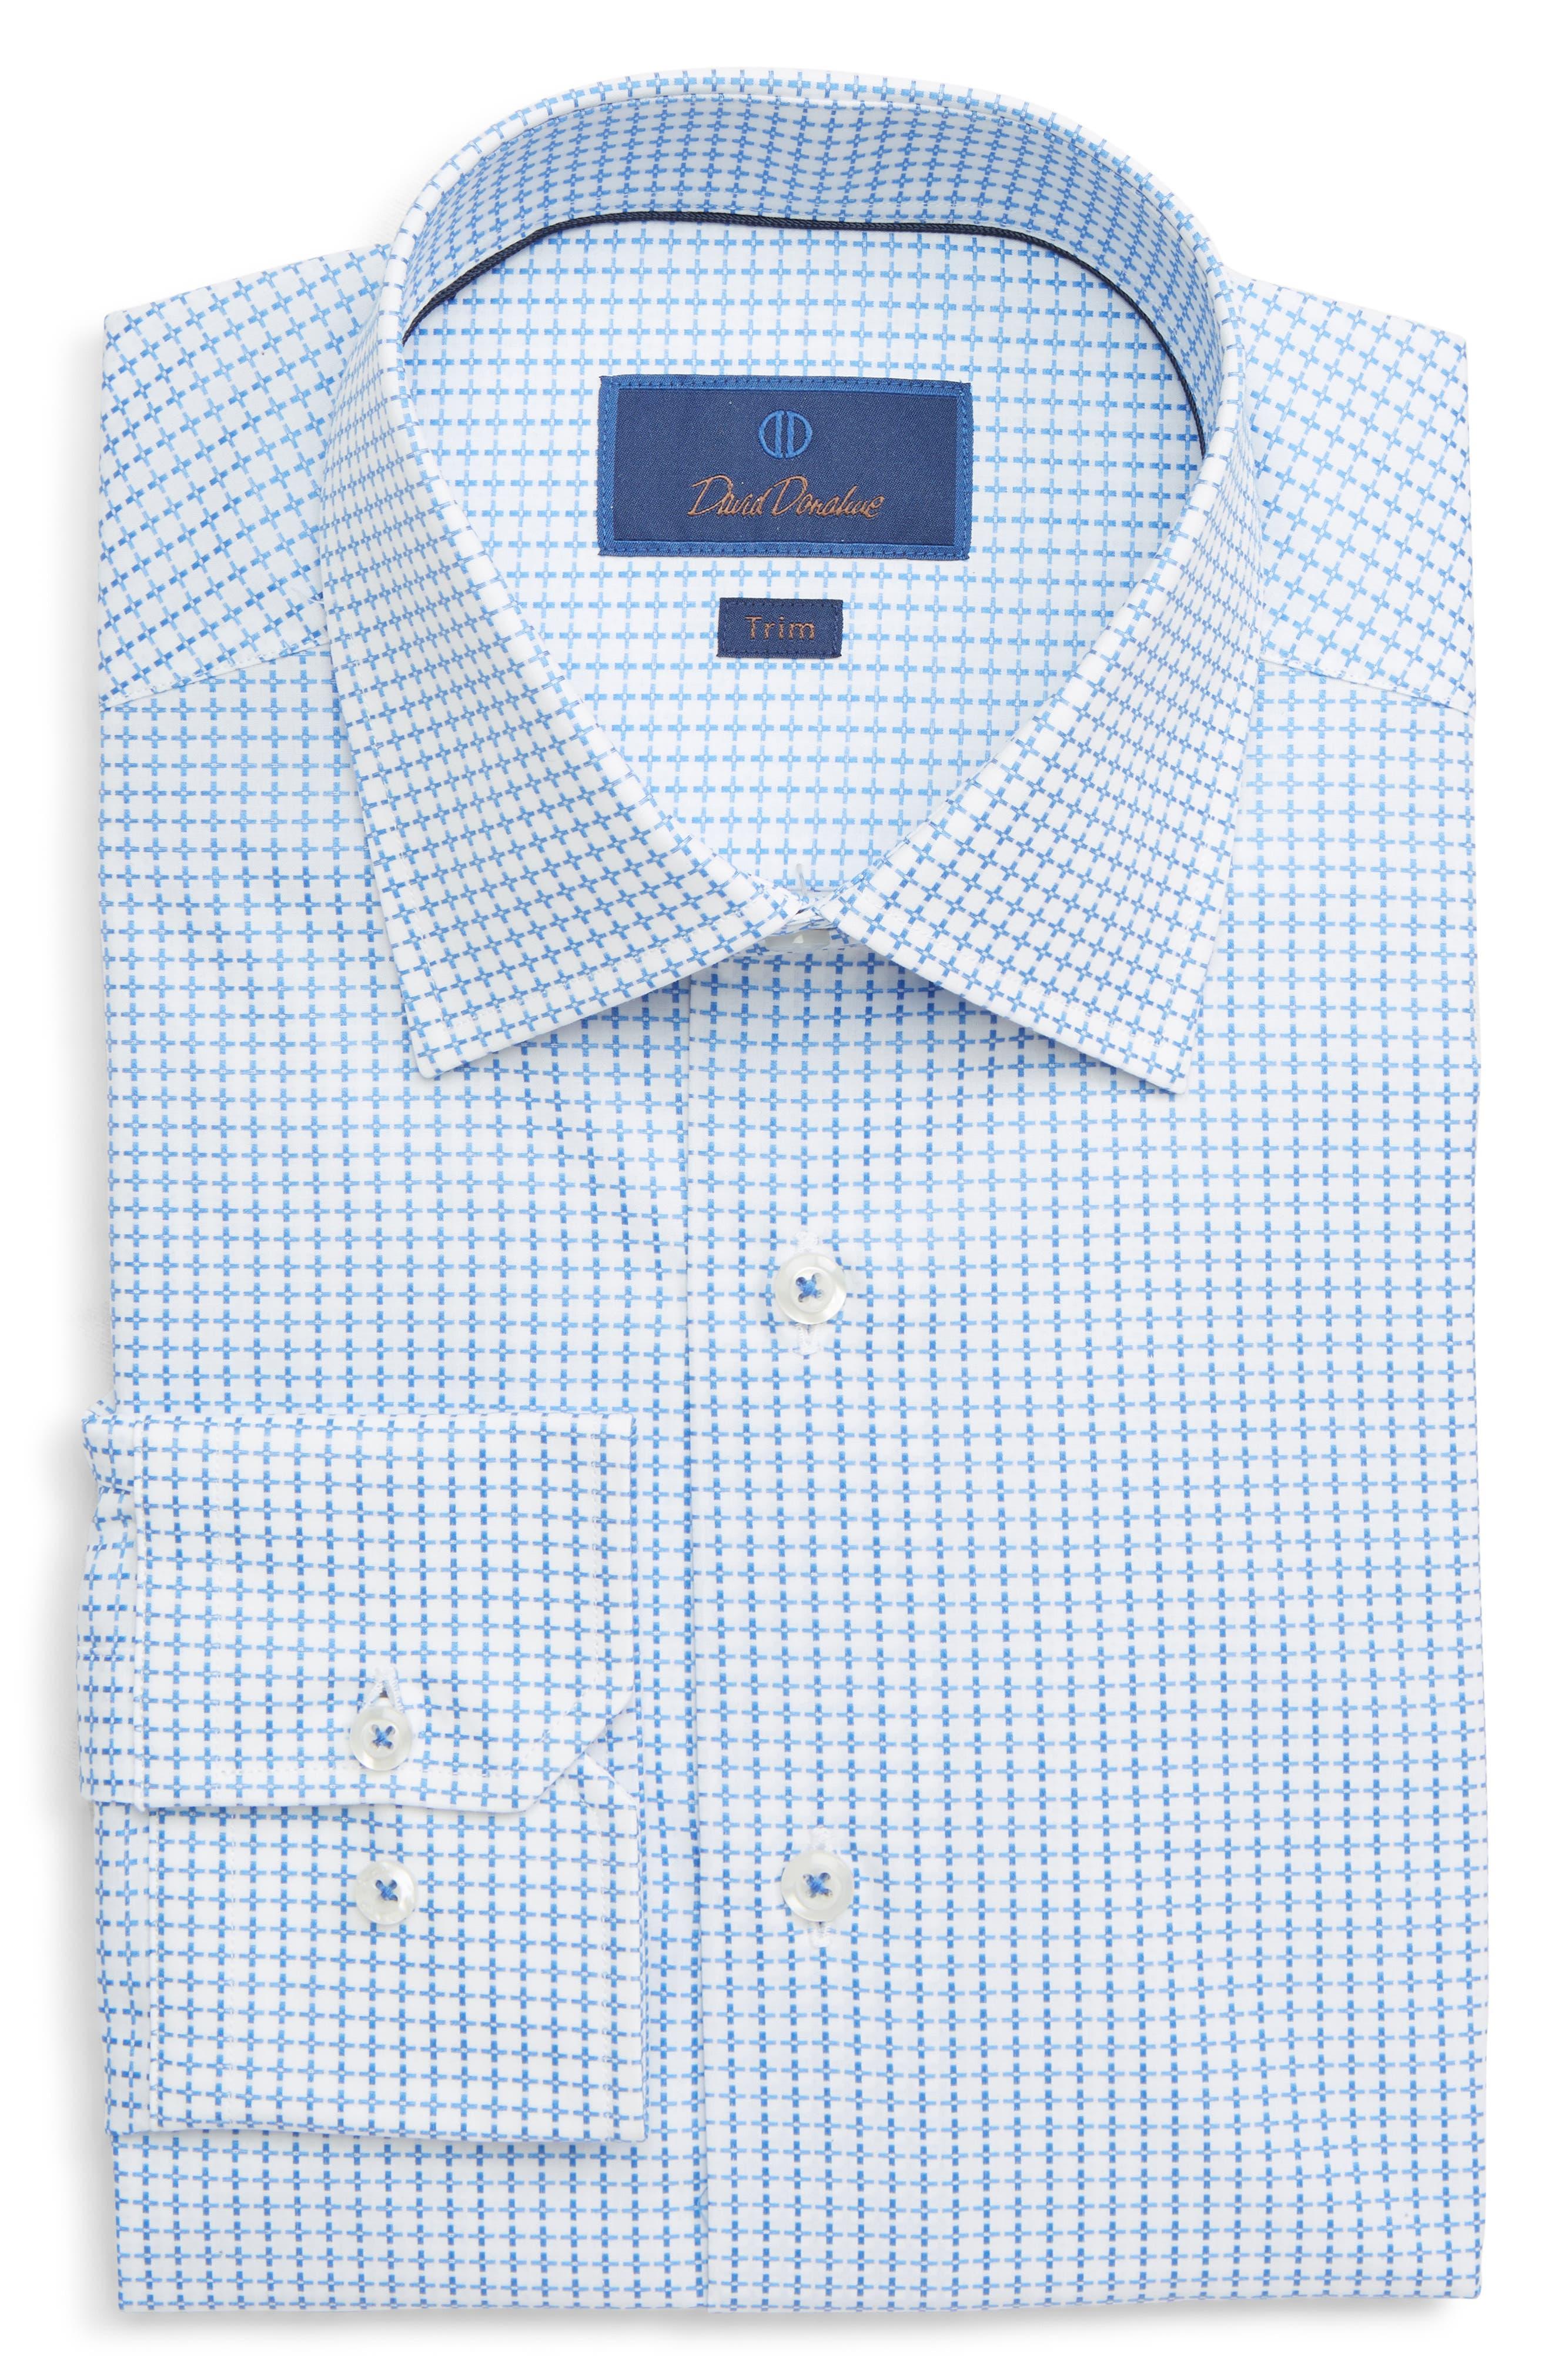 DAVID DONAHUE Trim Fit Geometric Dress Shirt, Main, color, BLUE